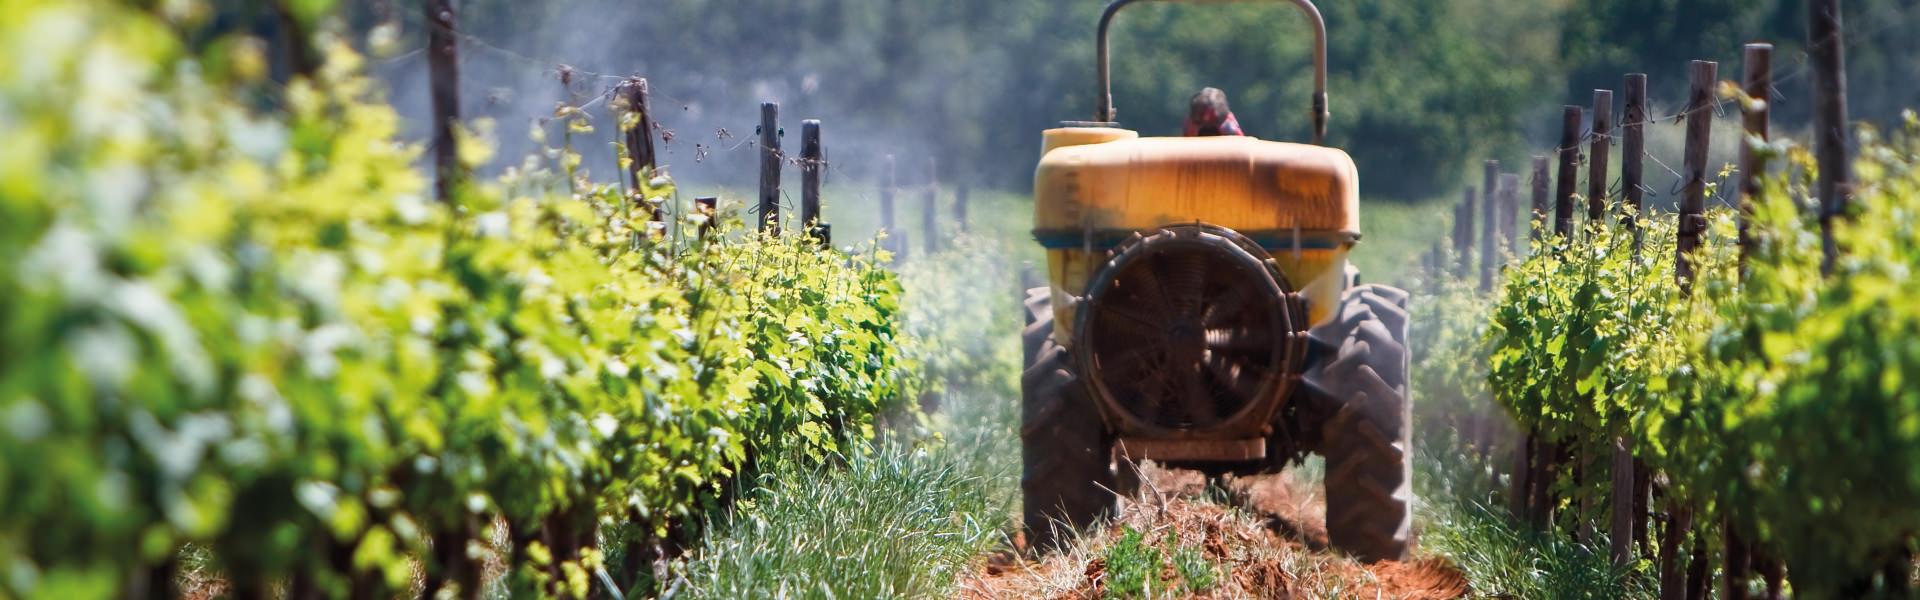 Zarpellon agricoltura-Testata-Servizi_Patentino-trattori